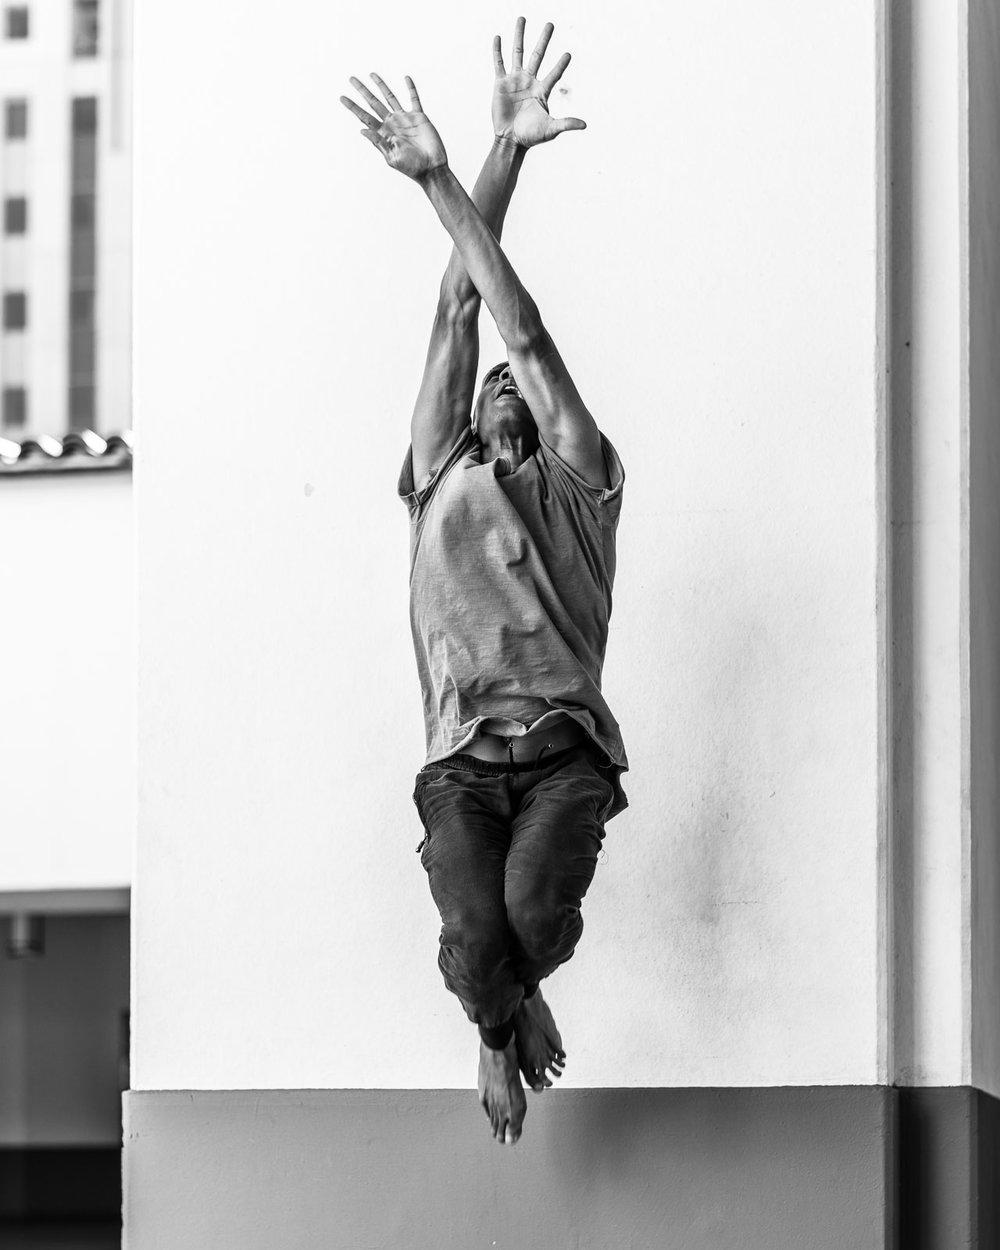 DancersandUnionStationDec2016 (1 of 1)-42.jpg